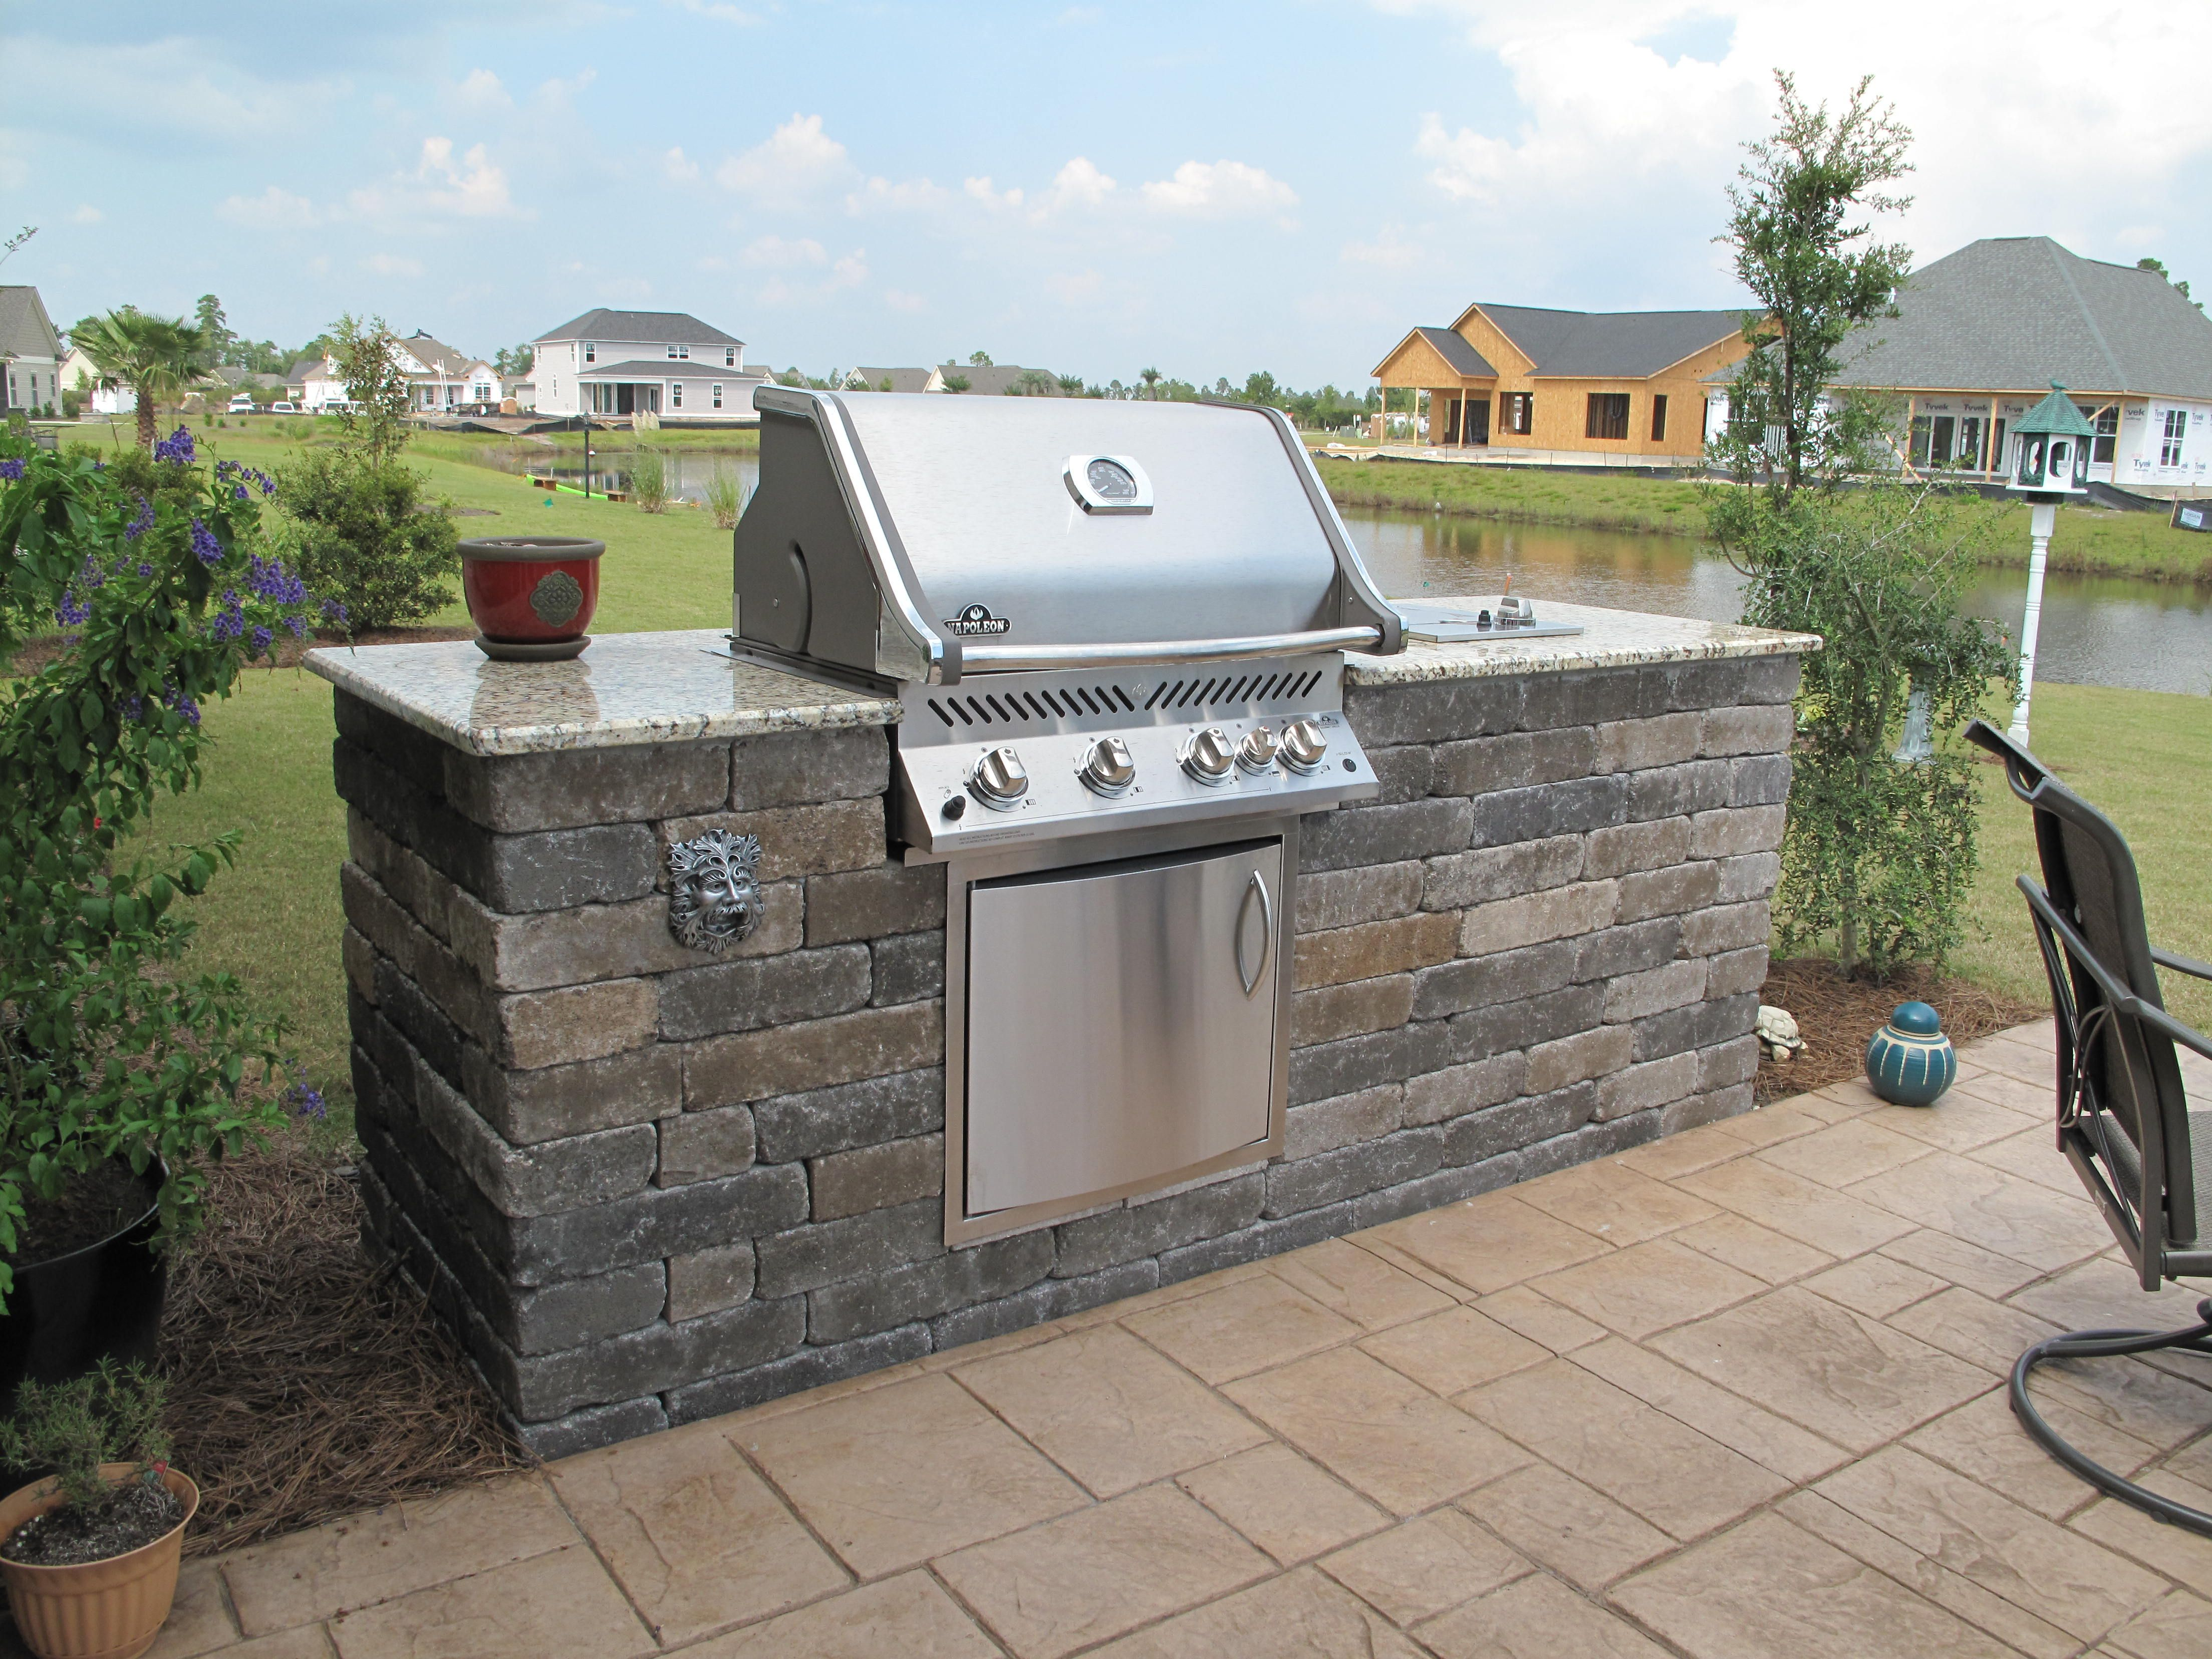 Extended outdoor BBQ island   Bbq island, Build outdoor ... on Diy Patio Grill Island id=54172